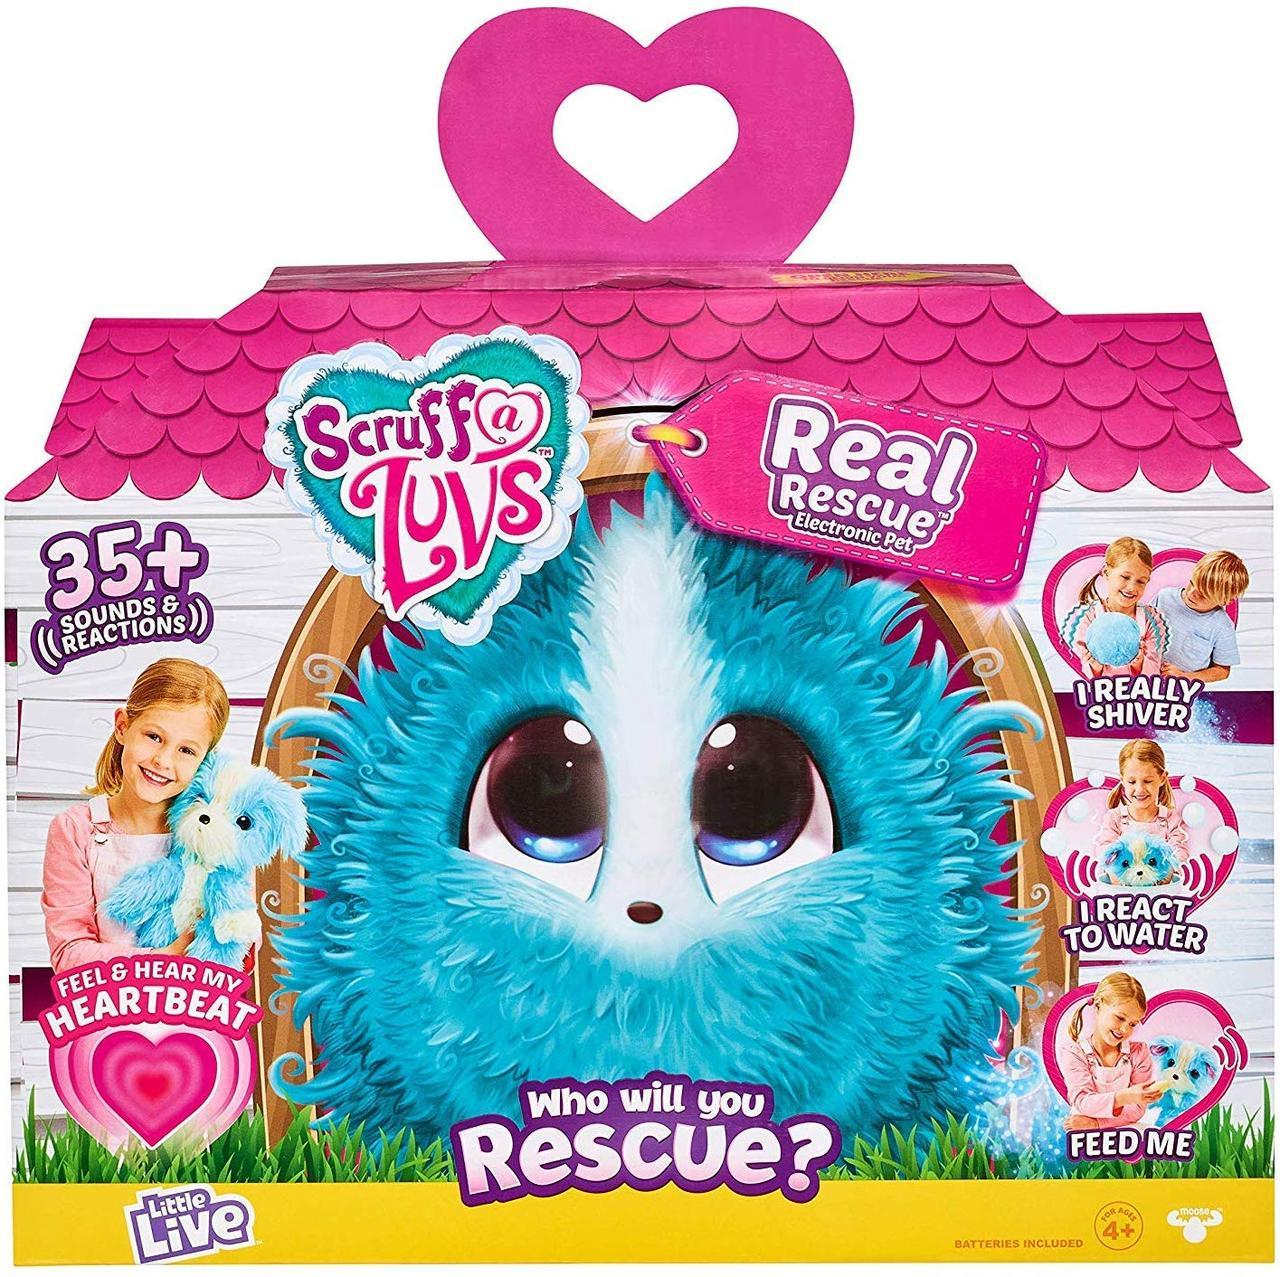 Интерактивная мягкая игрушка собачка или кошка Няшка-Потеряшка. Scruff-a-Luvs Electronic Pet. Оригинал из США